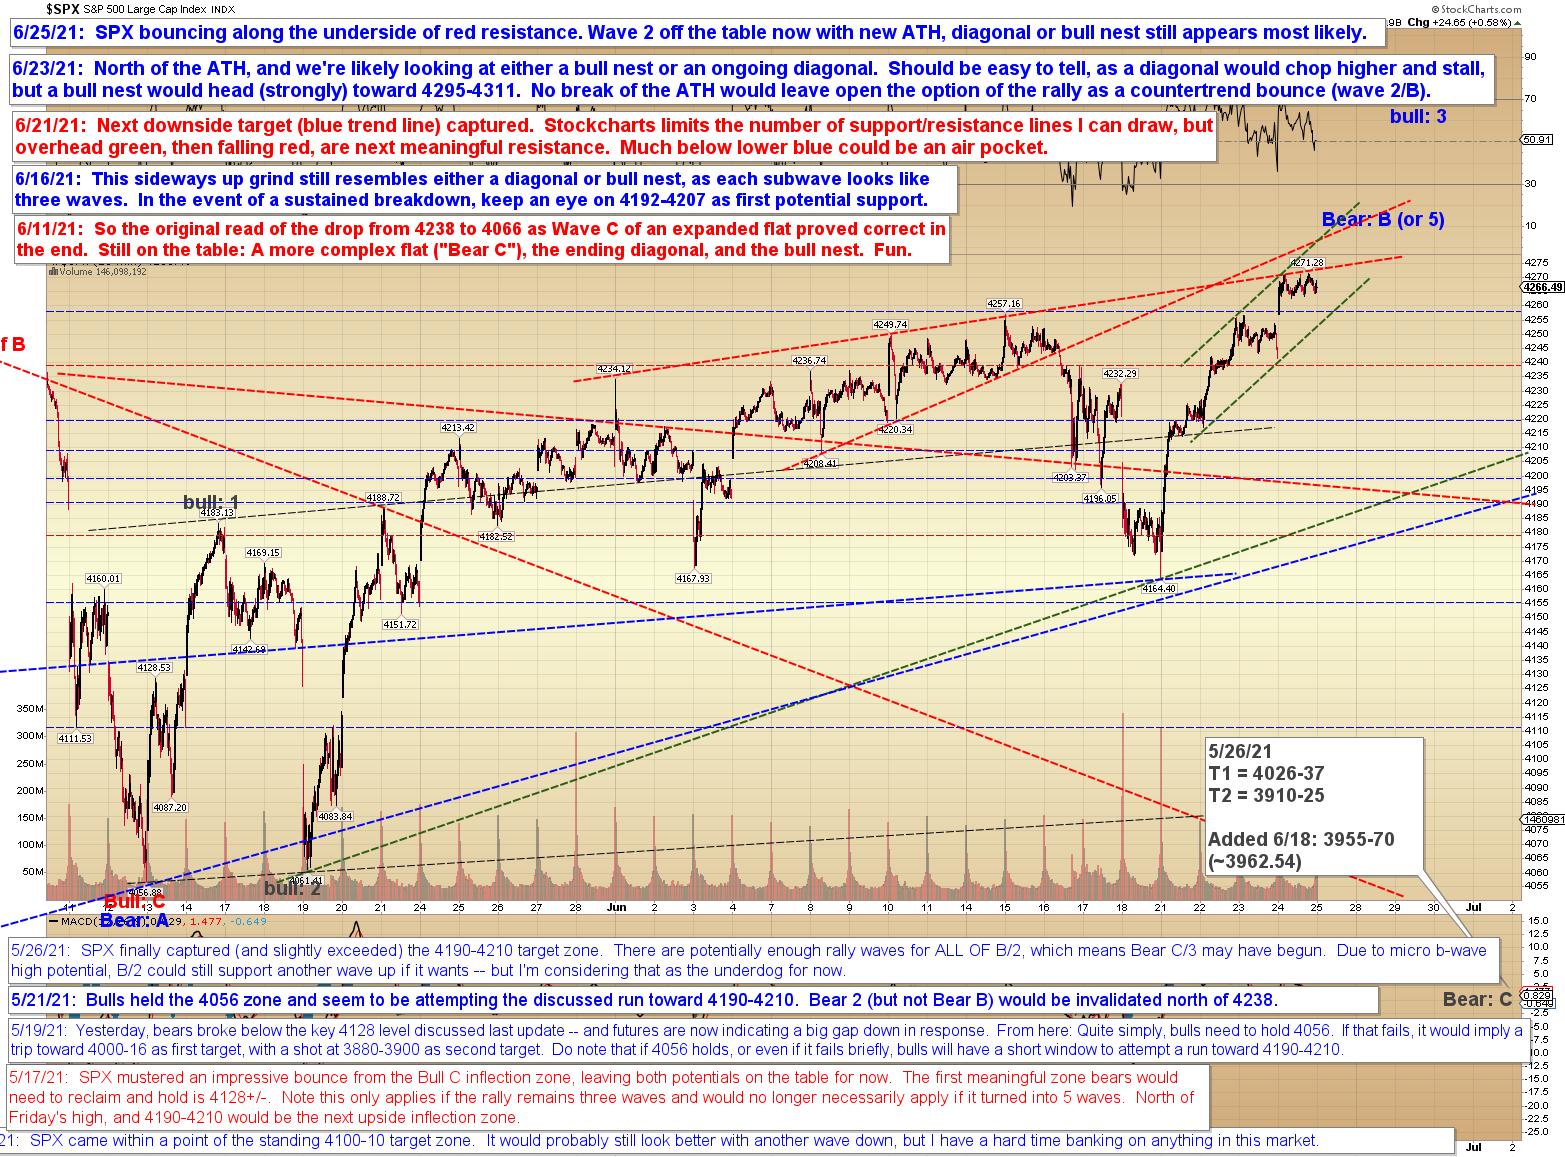 Pretzel Logic's Market Charts and Analysis: June 2021